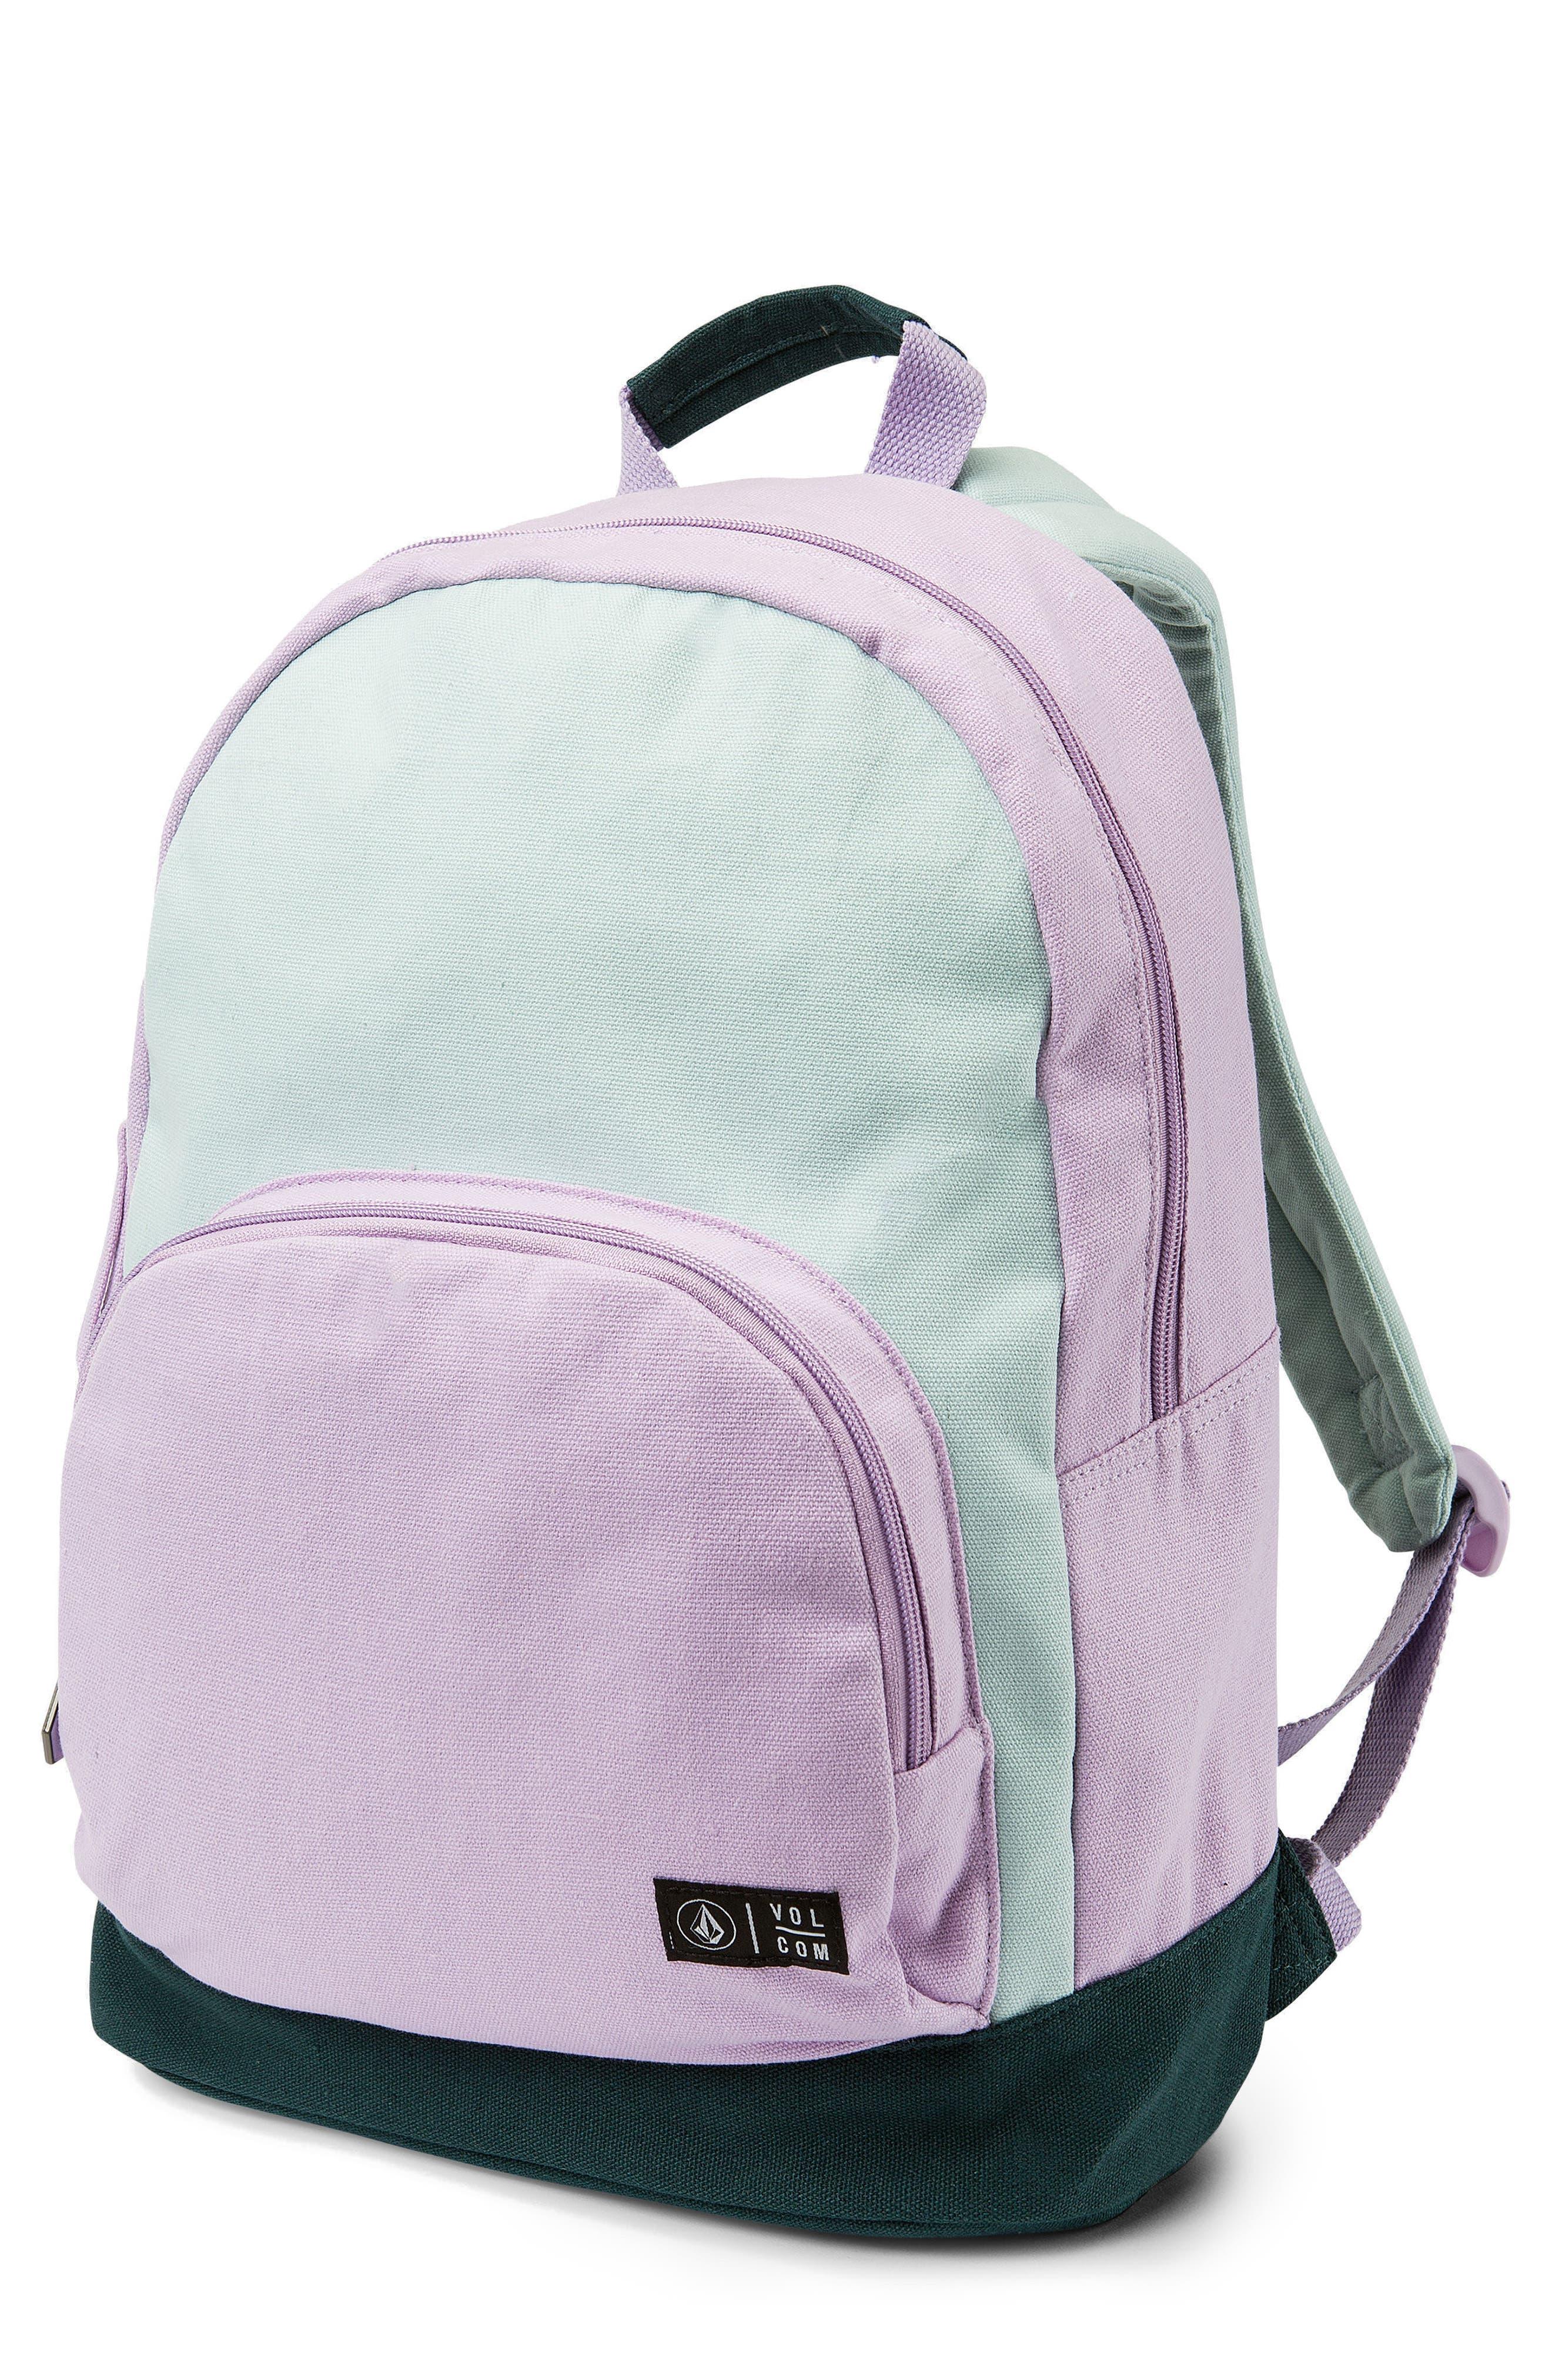 Schoolyard Canvas Backpack,                             Main thumbnail 1, color,                             Light Blue